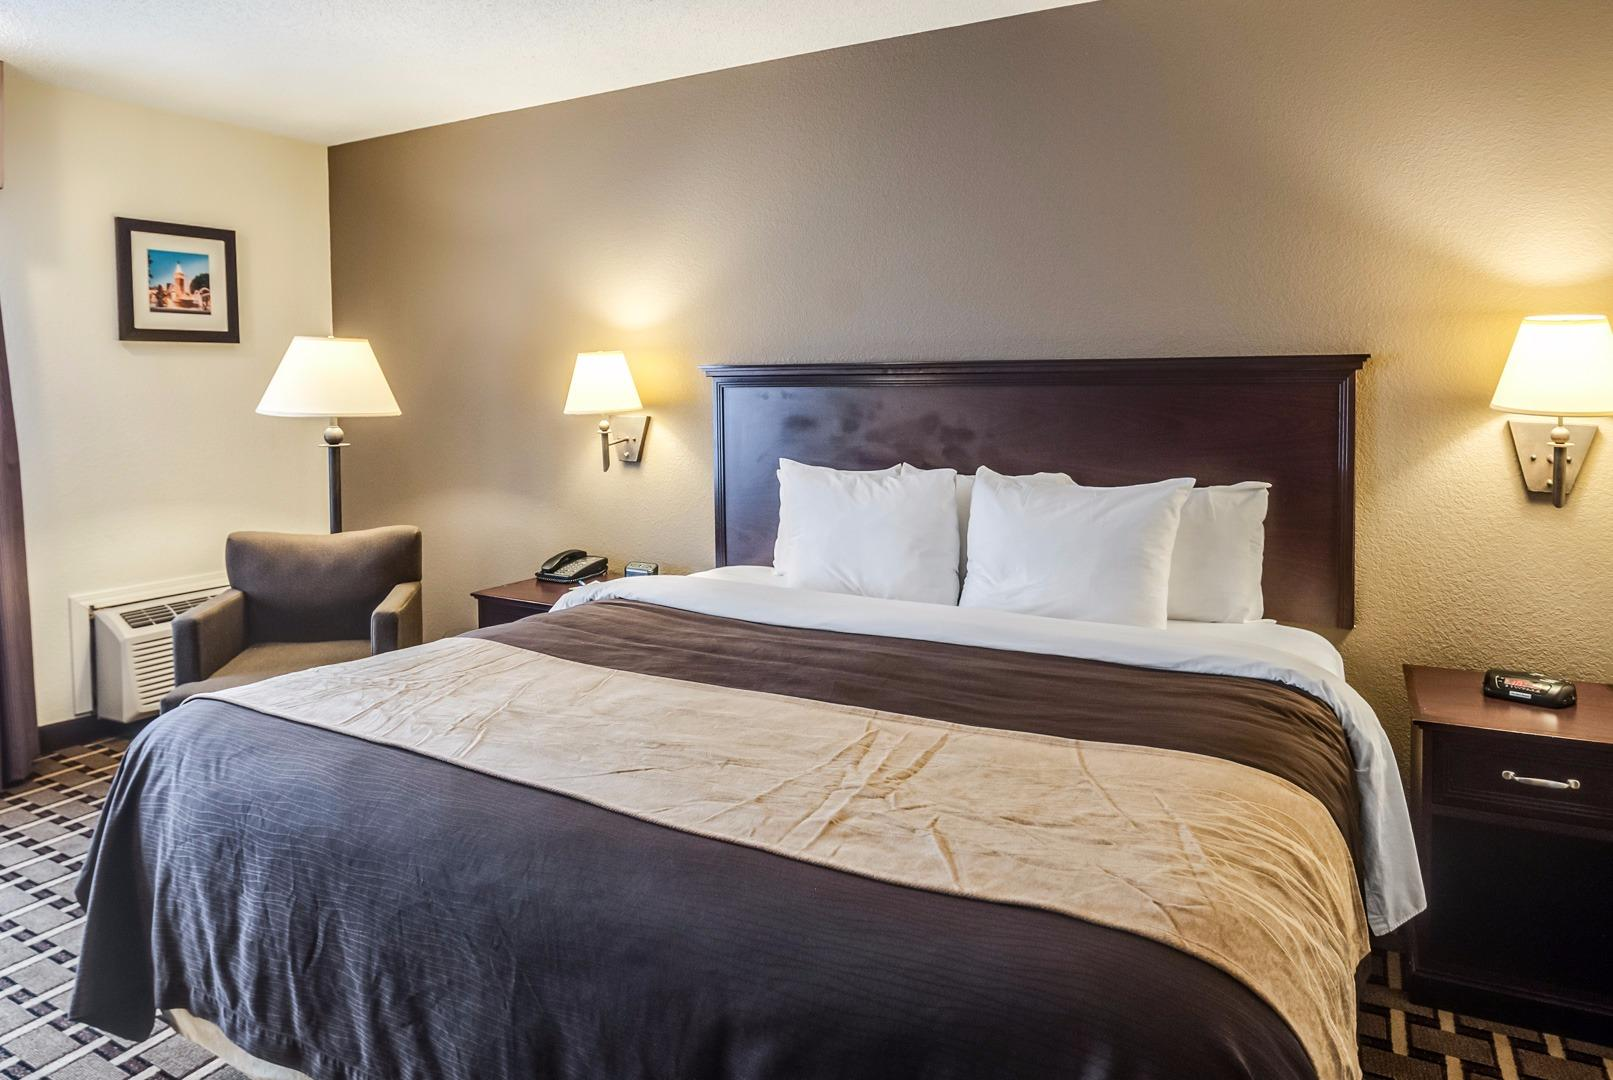 Comfort Inn Amp Suites Overland Park Kansas City South